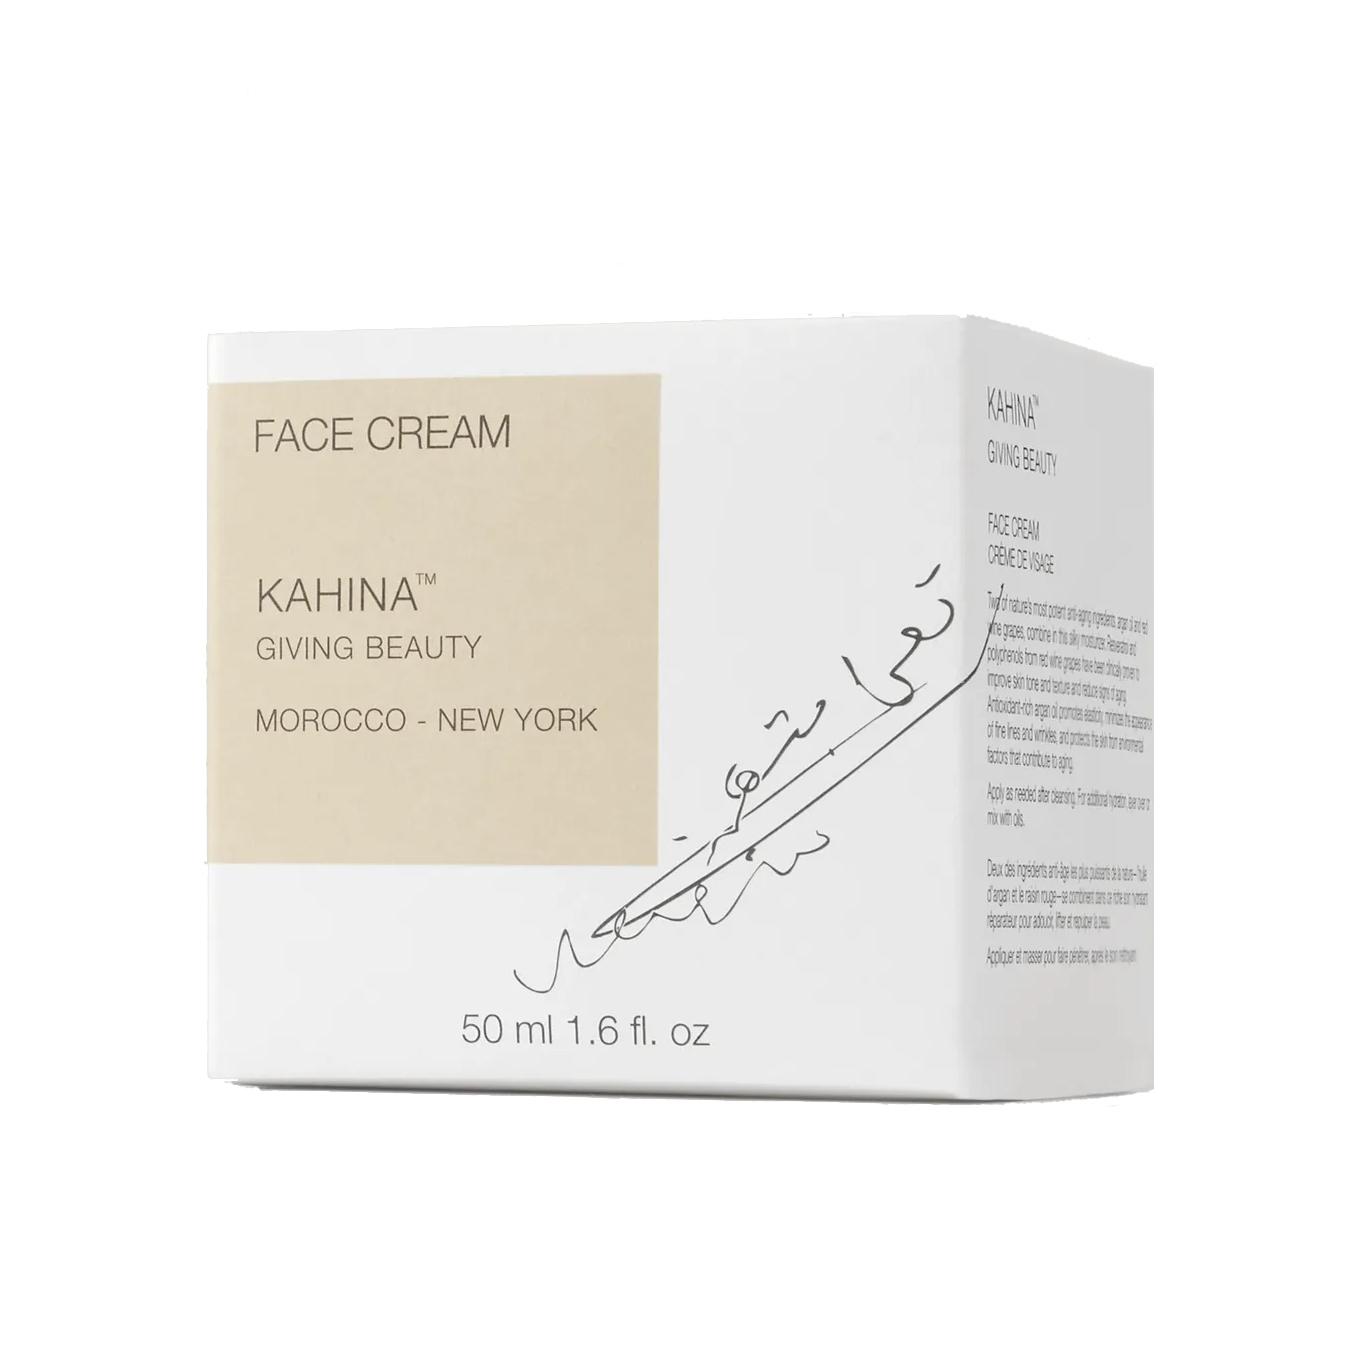 KAHINA GIVING BEAUTY Face Cream Bogaty krem odżywczy _ SoBio Beauty Boutique 2